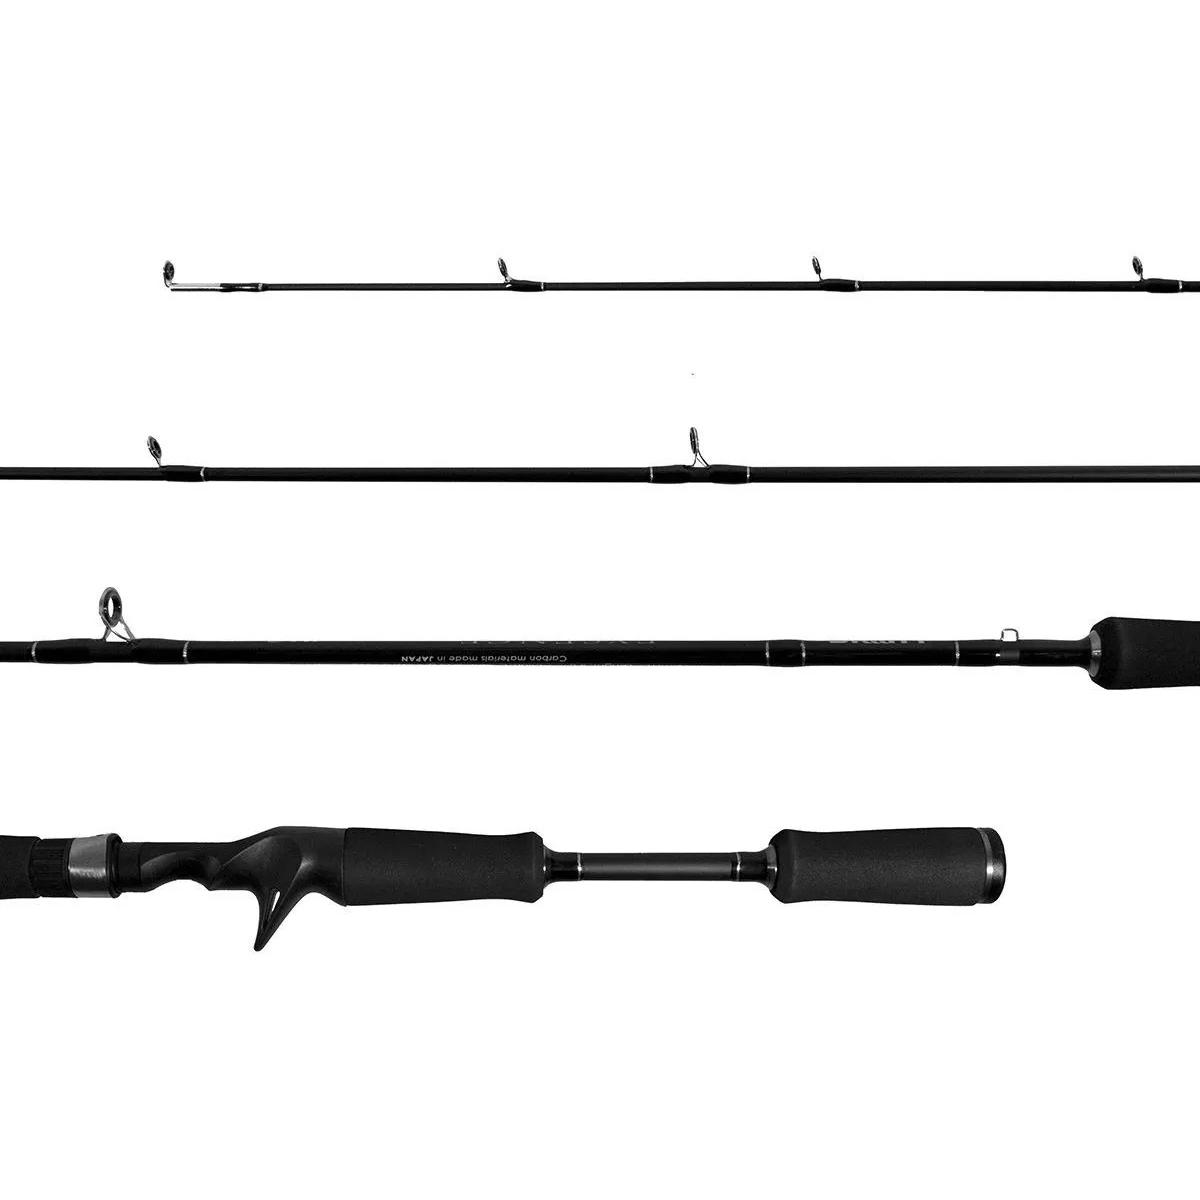 Vara Lumis Exsence 561 (1,68m) 6-17lb  P/ Carretilha Inteiriça  - Pesca Adventure